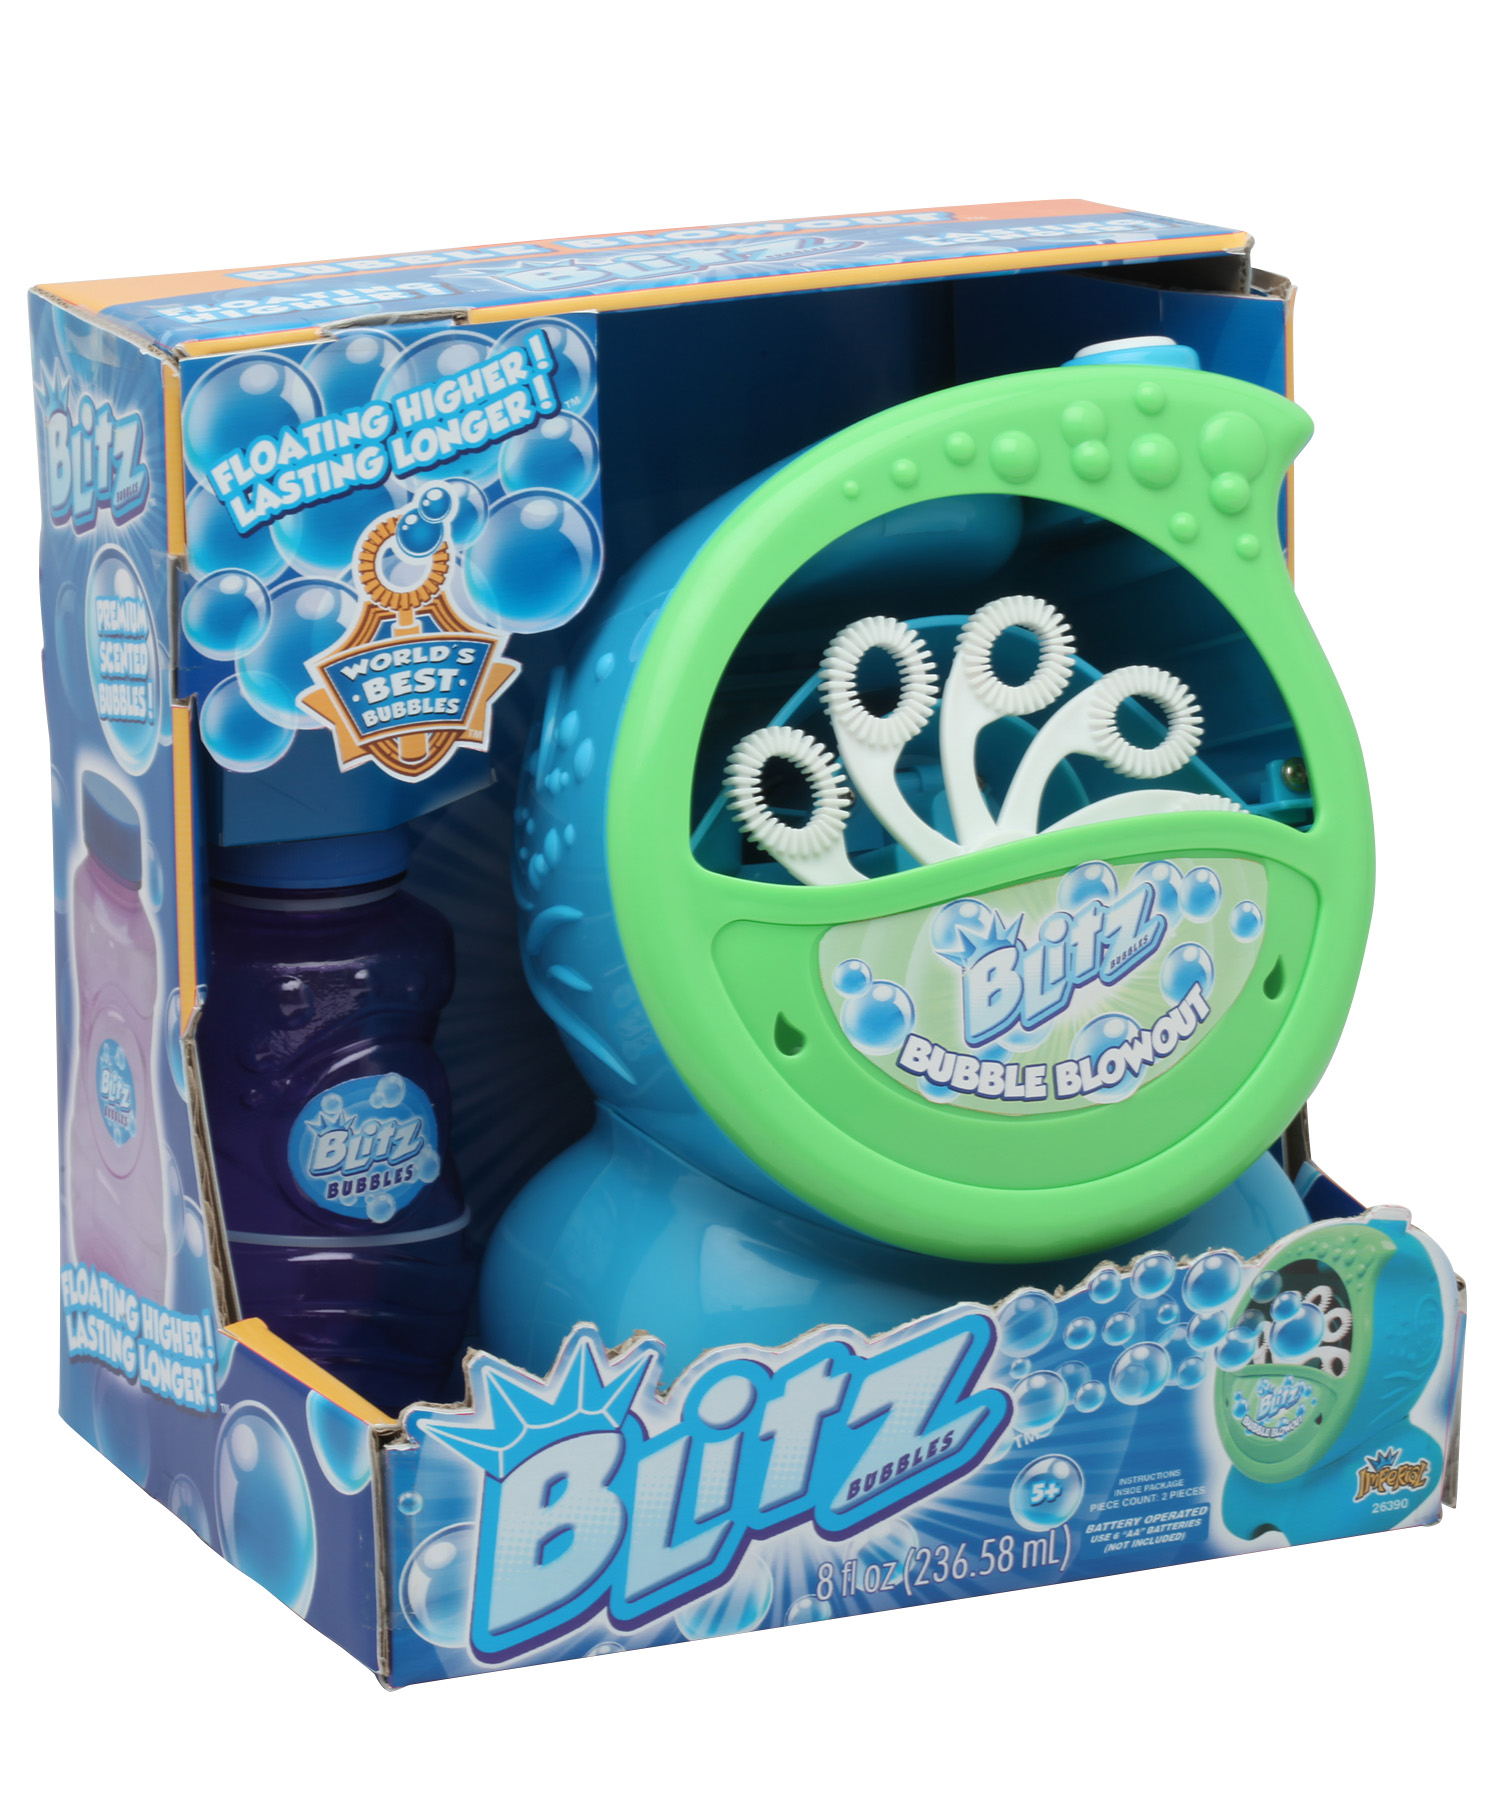 Blitz Bubble Blowout Party Machine Walmart Inventory Checker